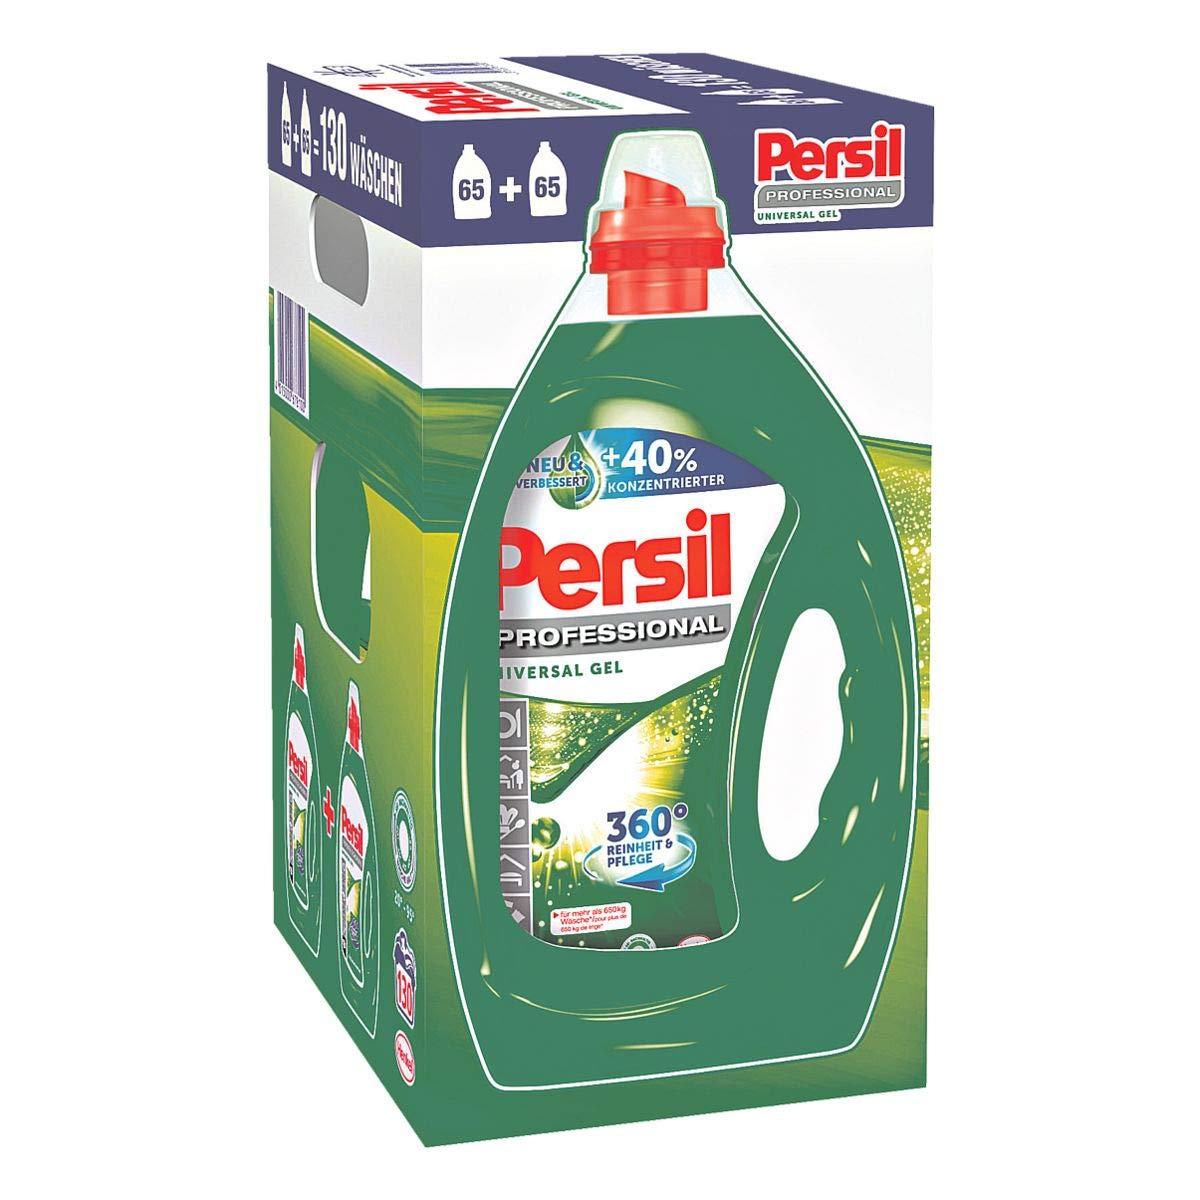 Persil Professional Universal Gel 2 x 65 WL, 6.5 LTR by Persil